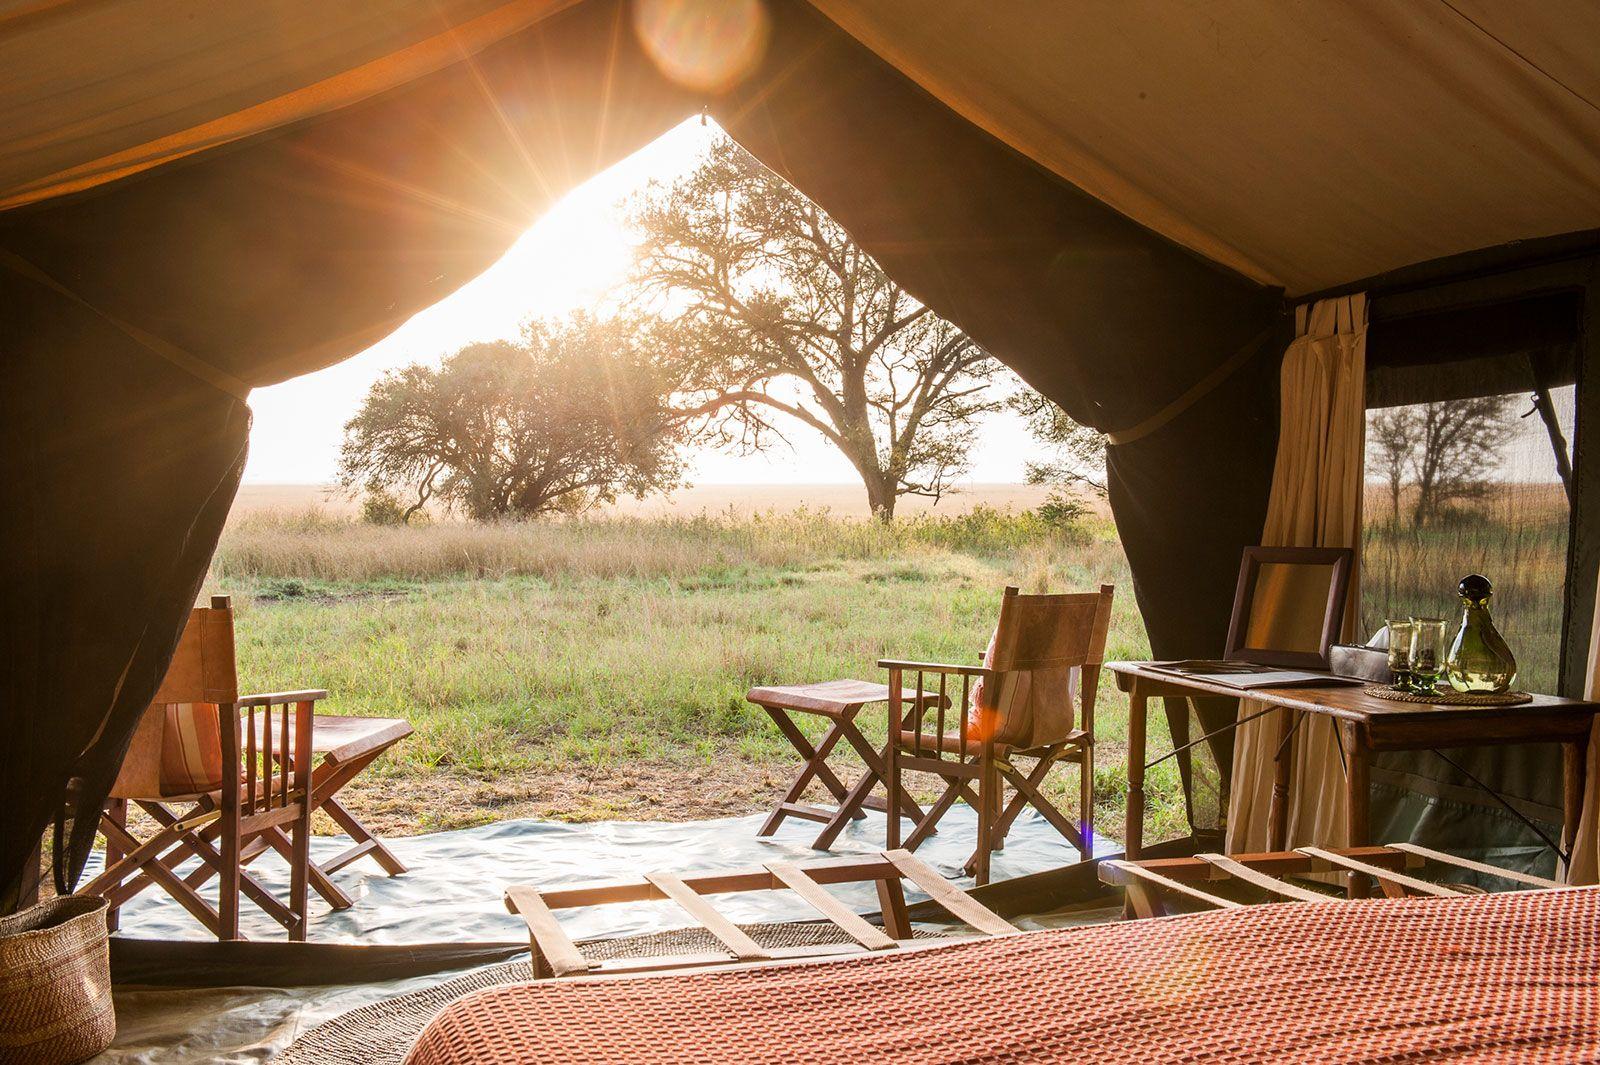 Serengeti Safari Camp